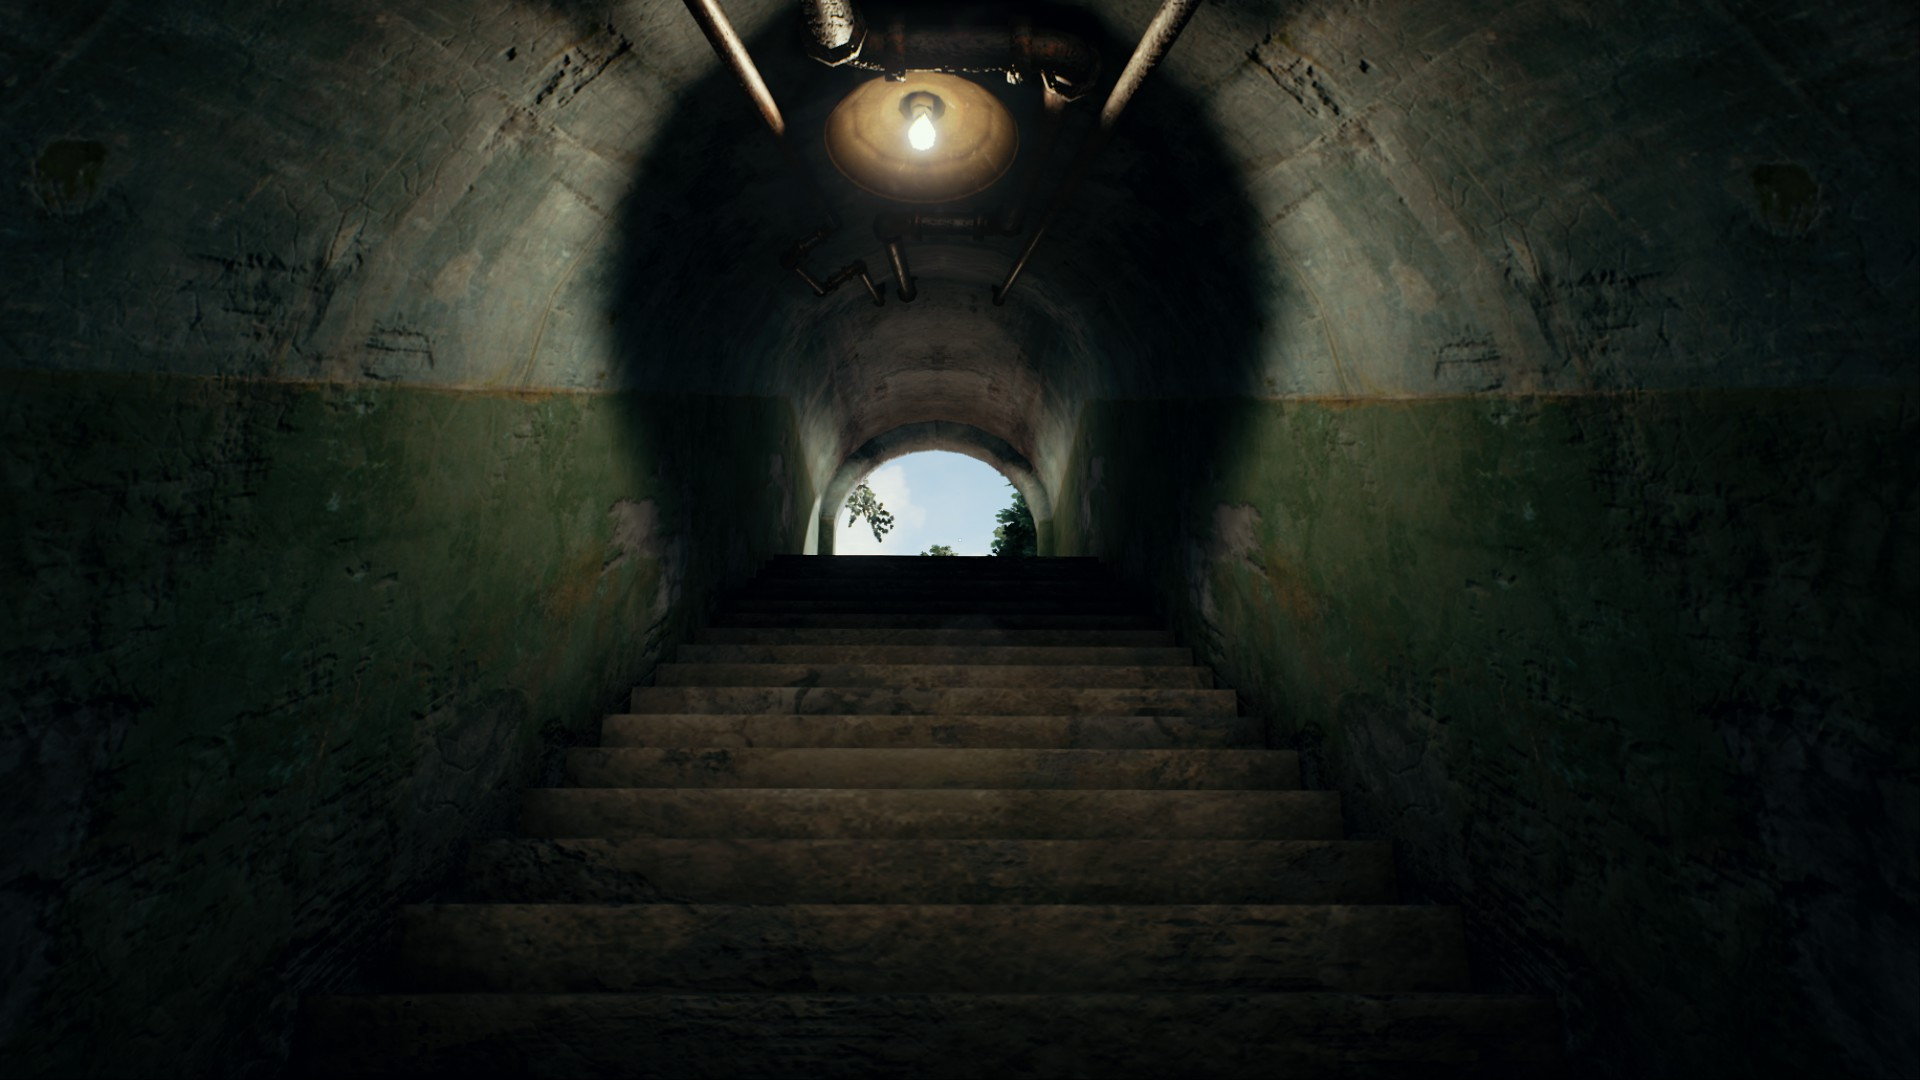 Pubg Hd Best Wallpaper: Bunker Tunnel System Map